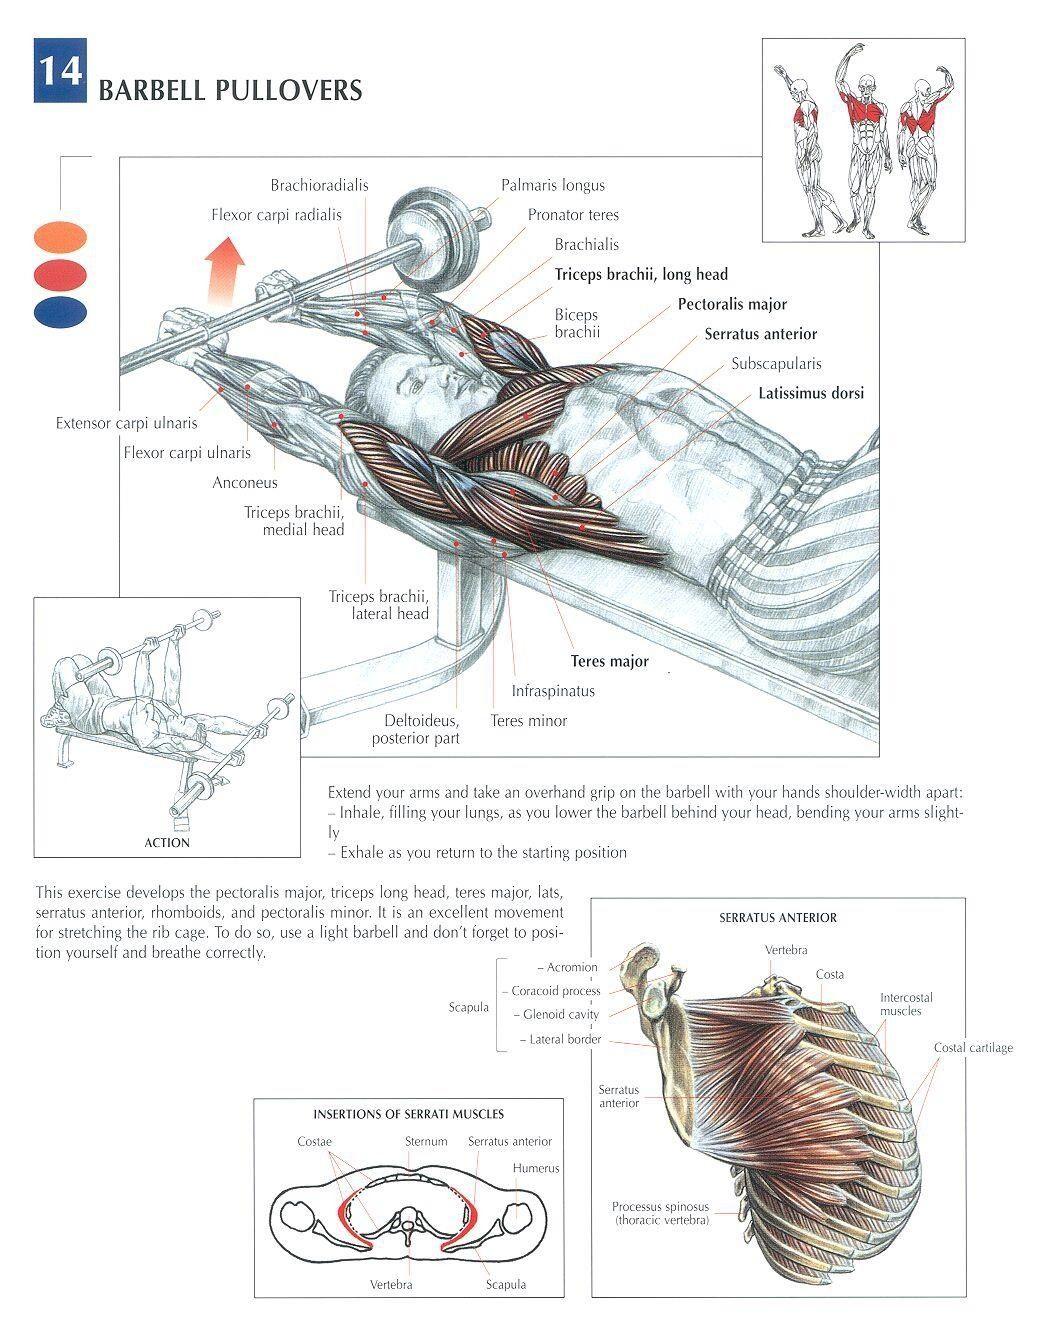 Barbell pullover for Serratus Anterior definition | Fitness ...